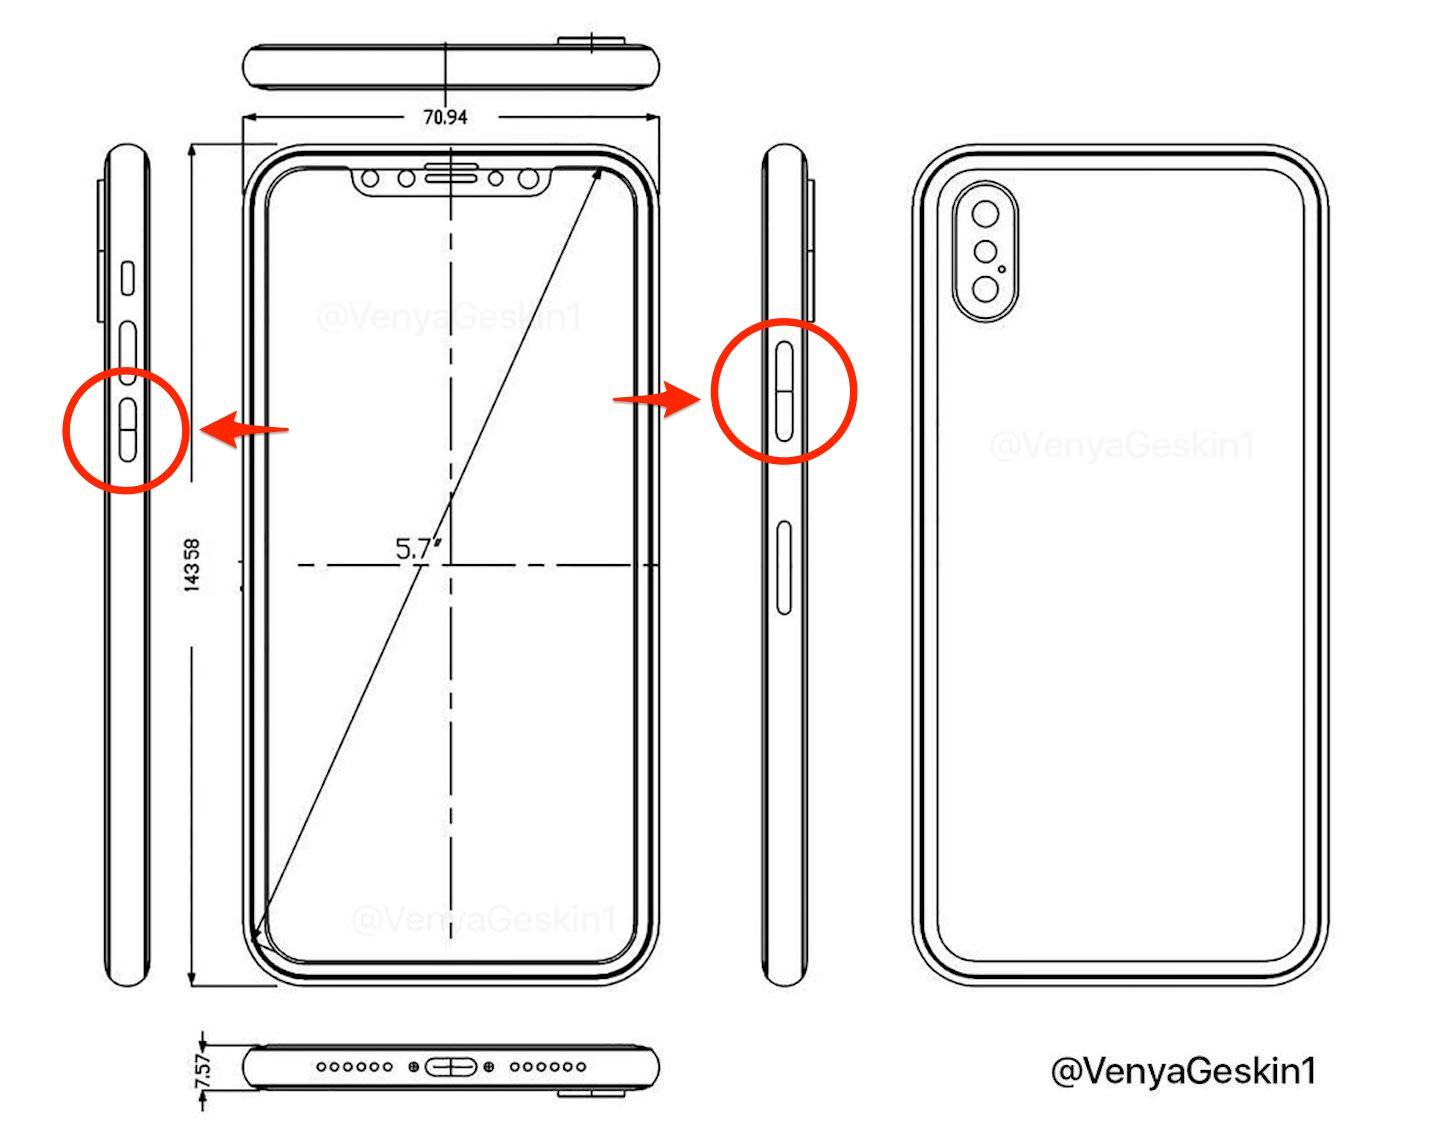 New-Schematics-for-iPhone8-2